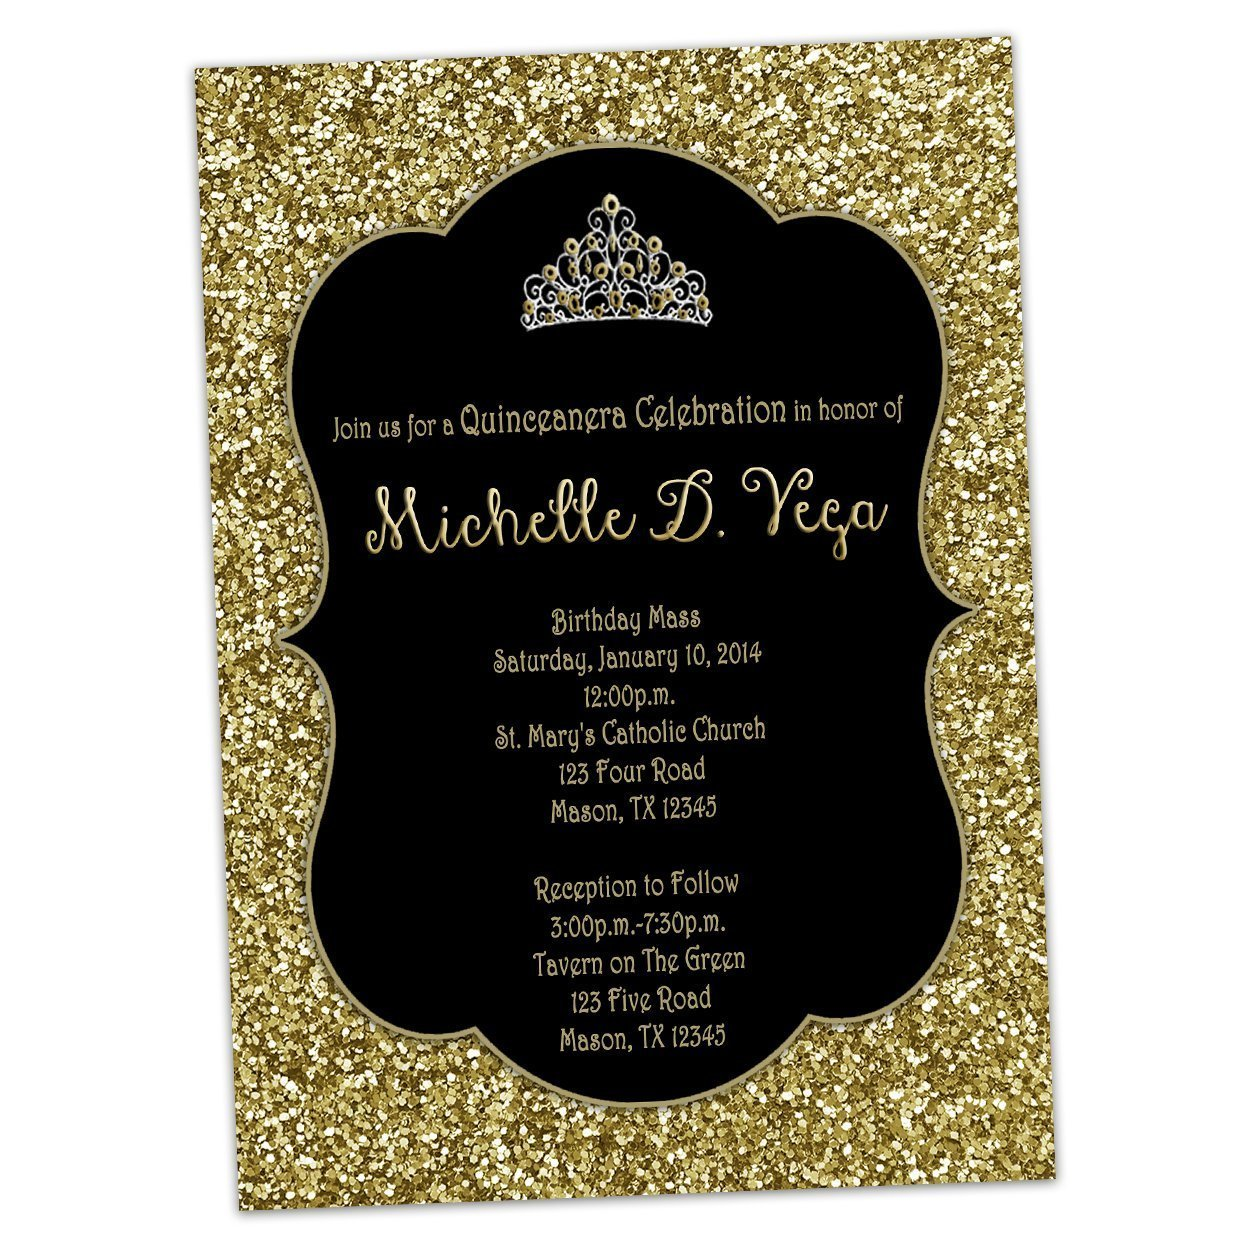 Black Gold Glitter Sweet 16 Invitations Princess Tiara Birthday by Party Print Express